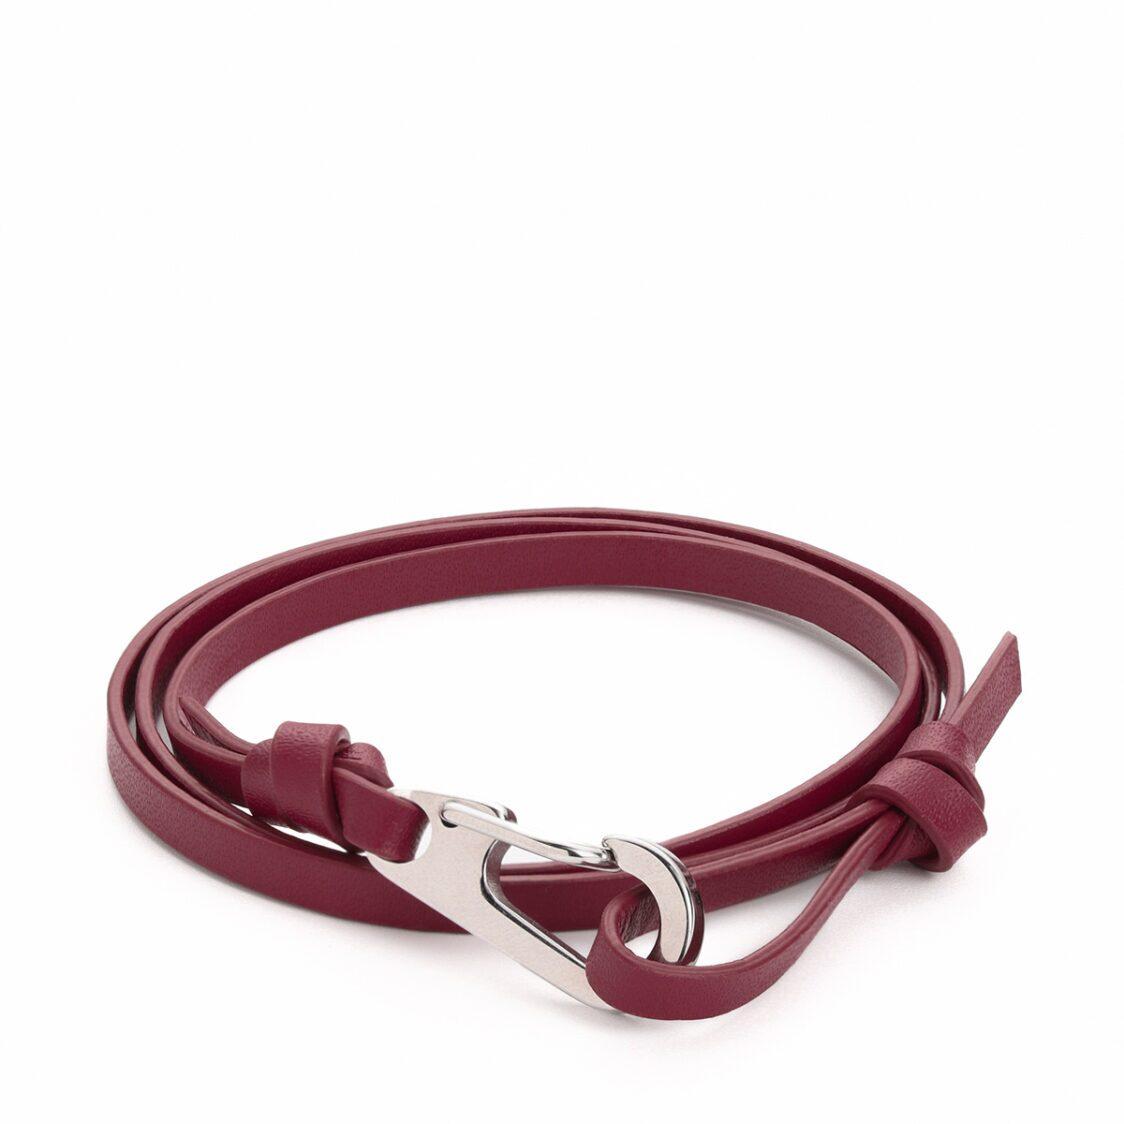 Plain Supplies Flo Bracelet - Burgundy Leather